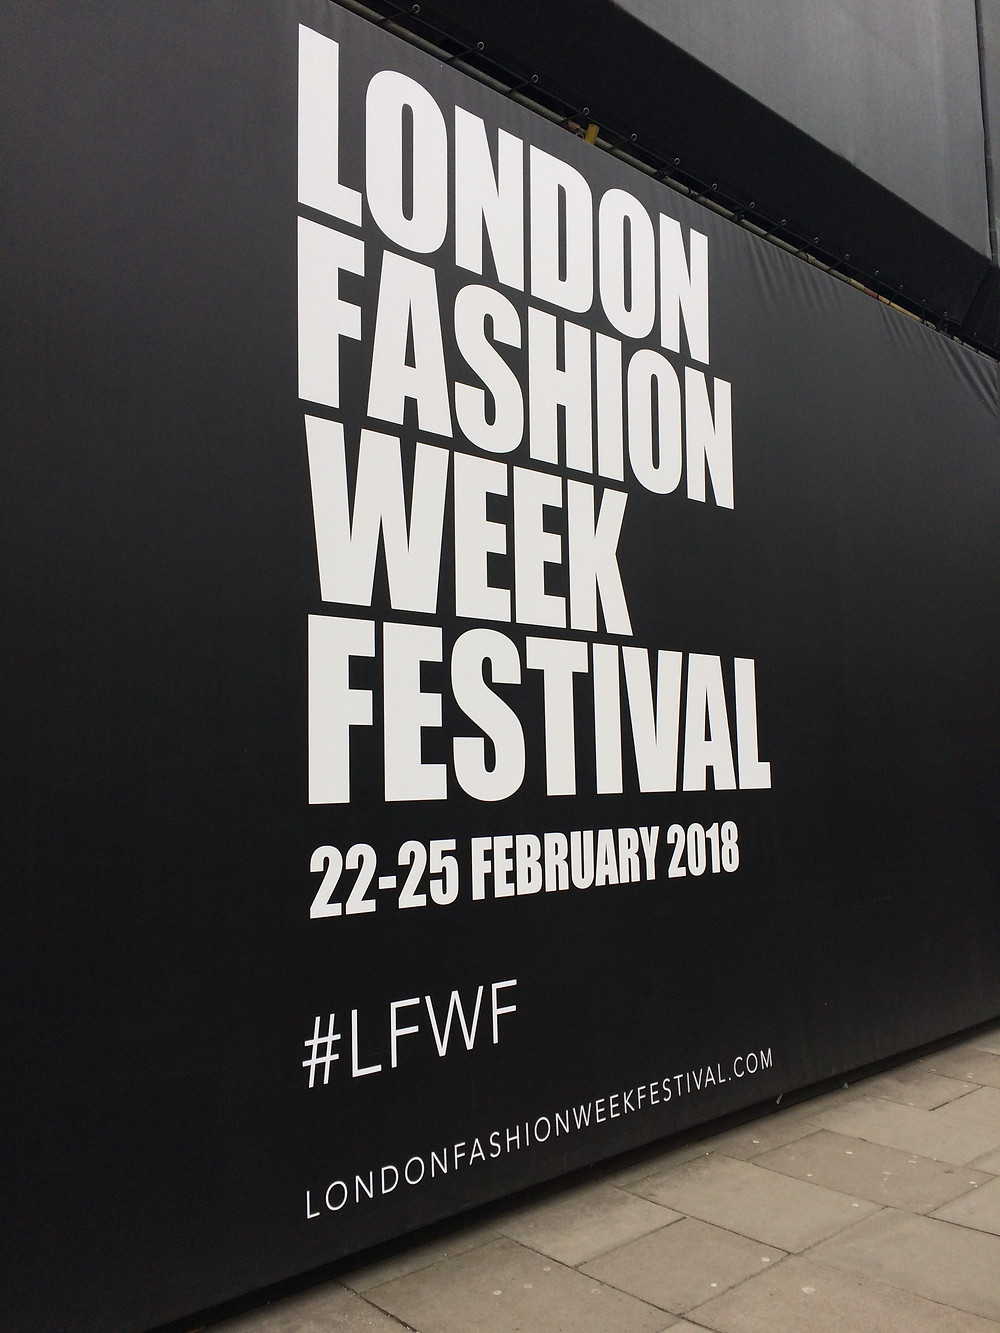 London Fashion Week, styling, catwalk show